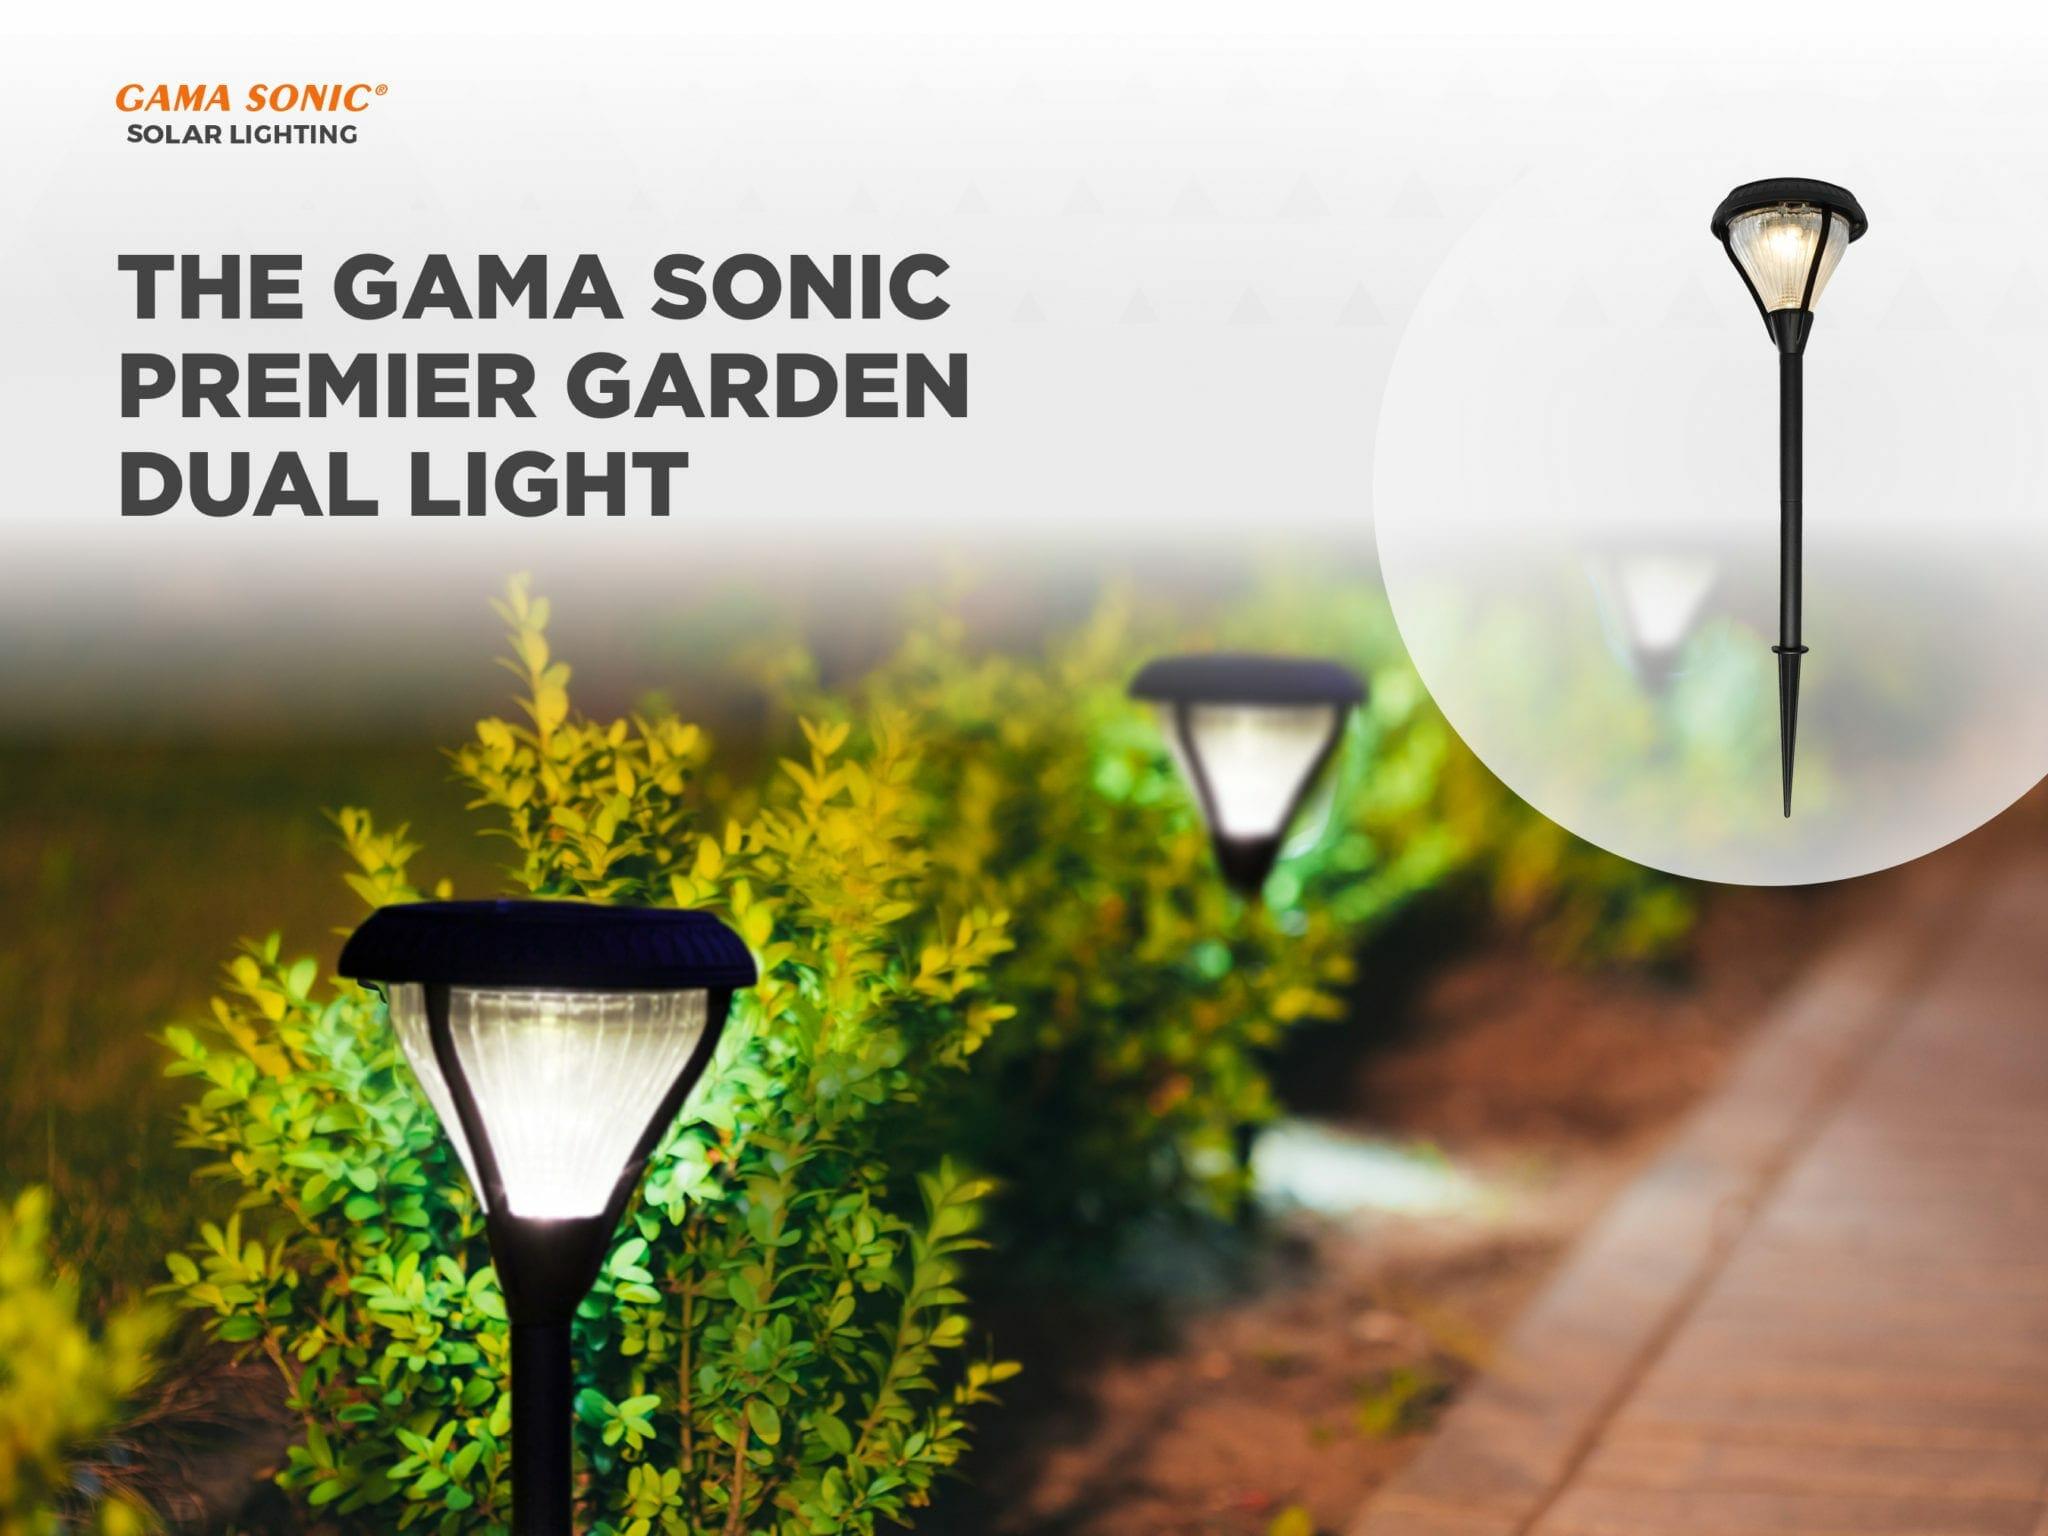 The Gama Sonic Premier Garden Dual Light - Light of the Month